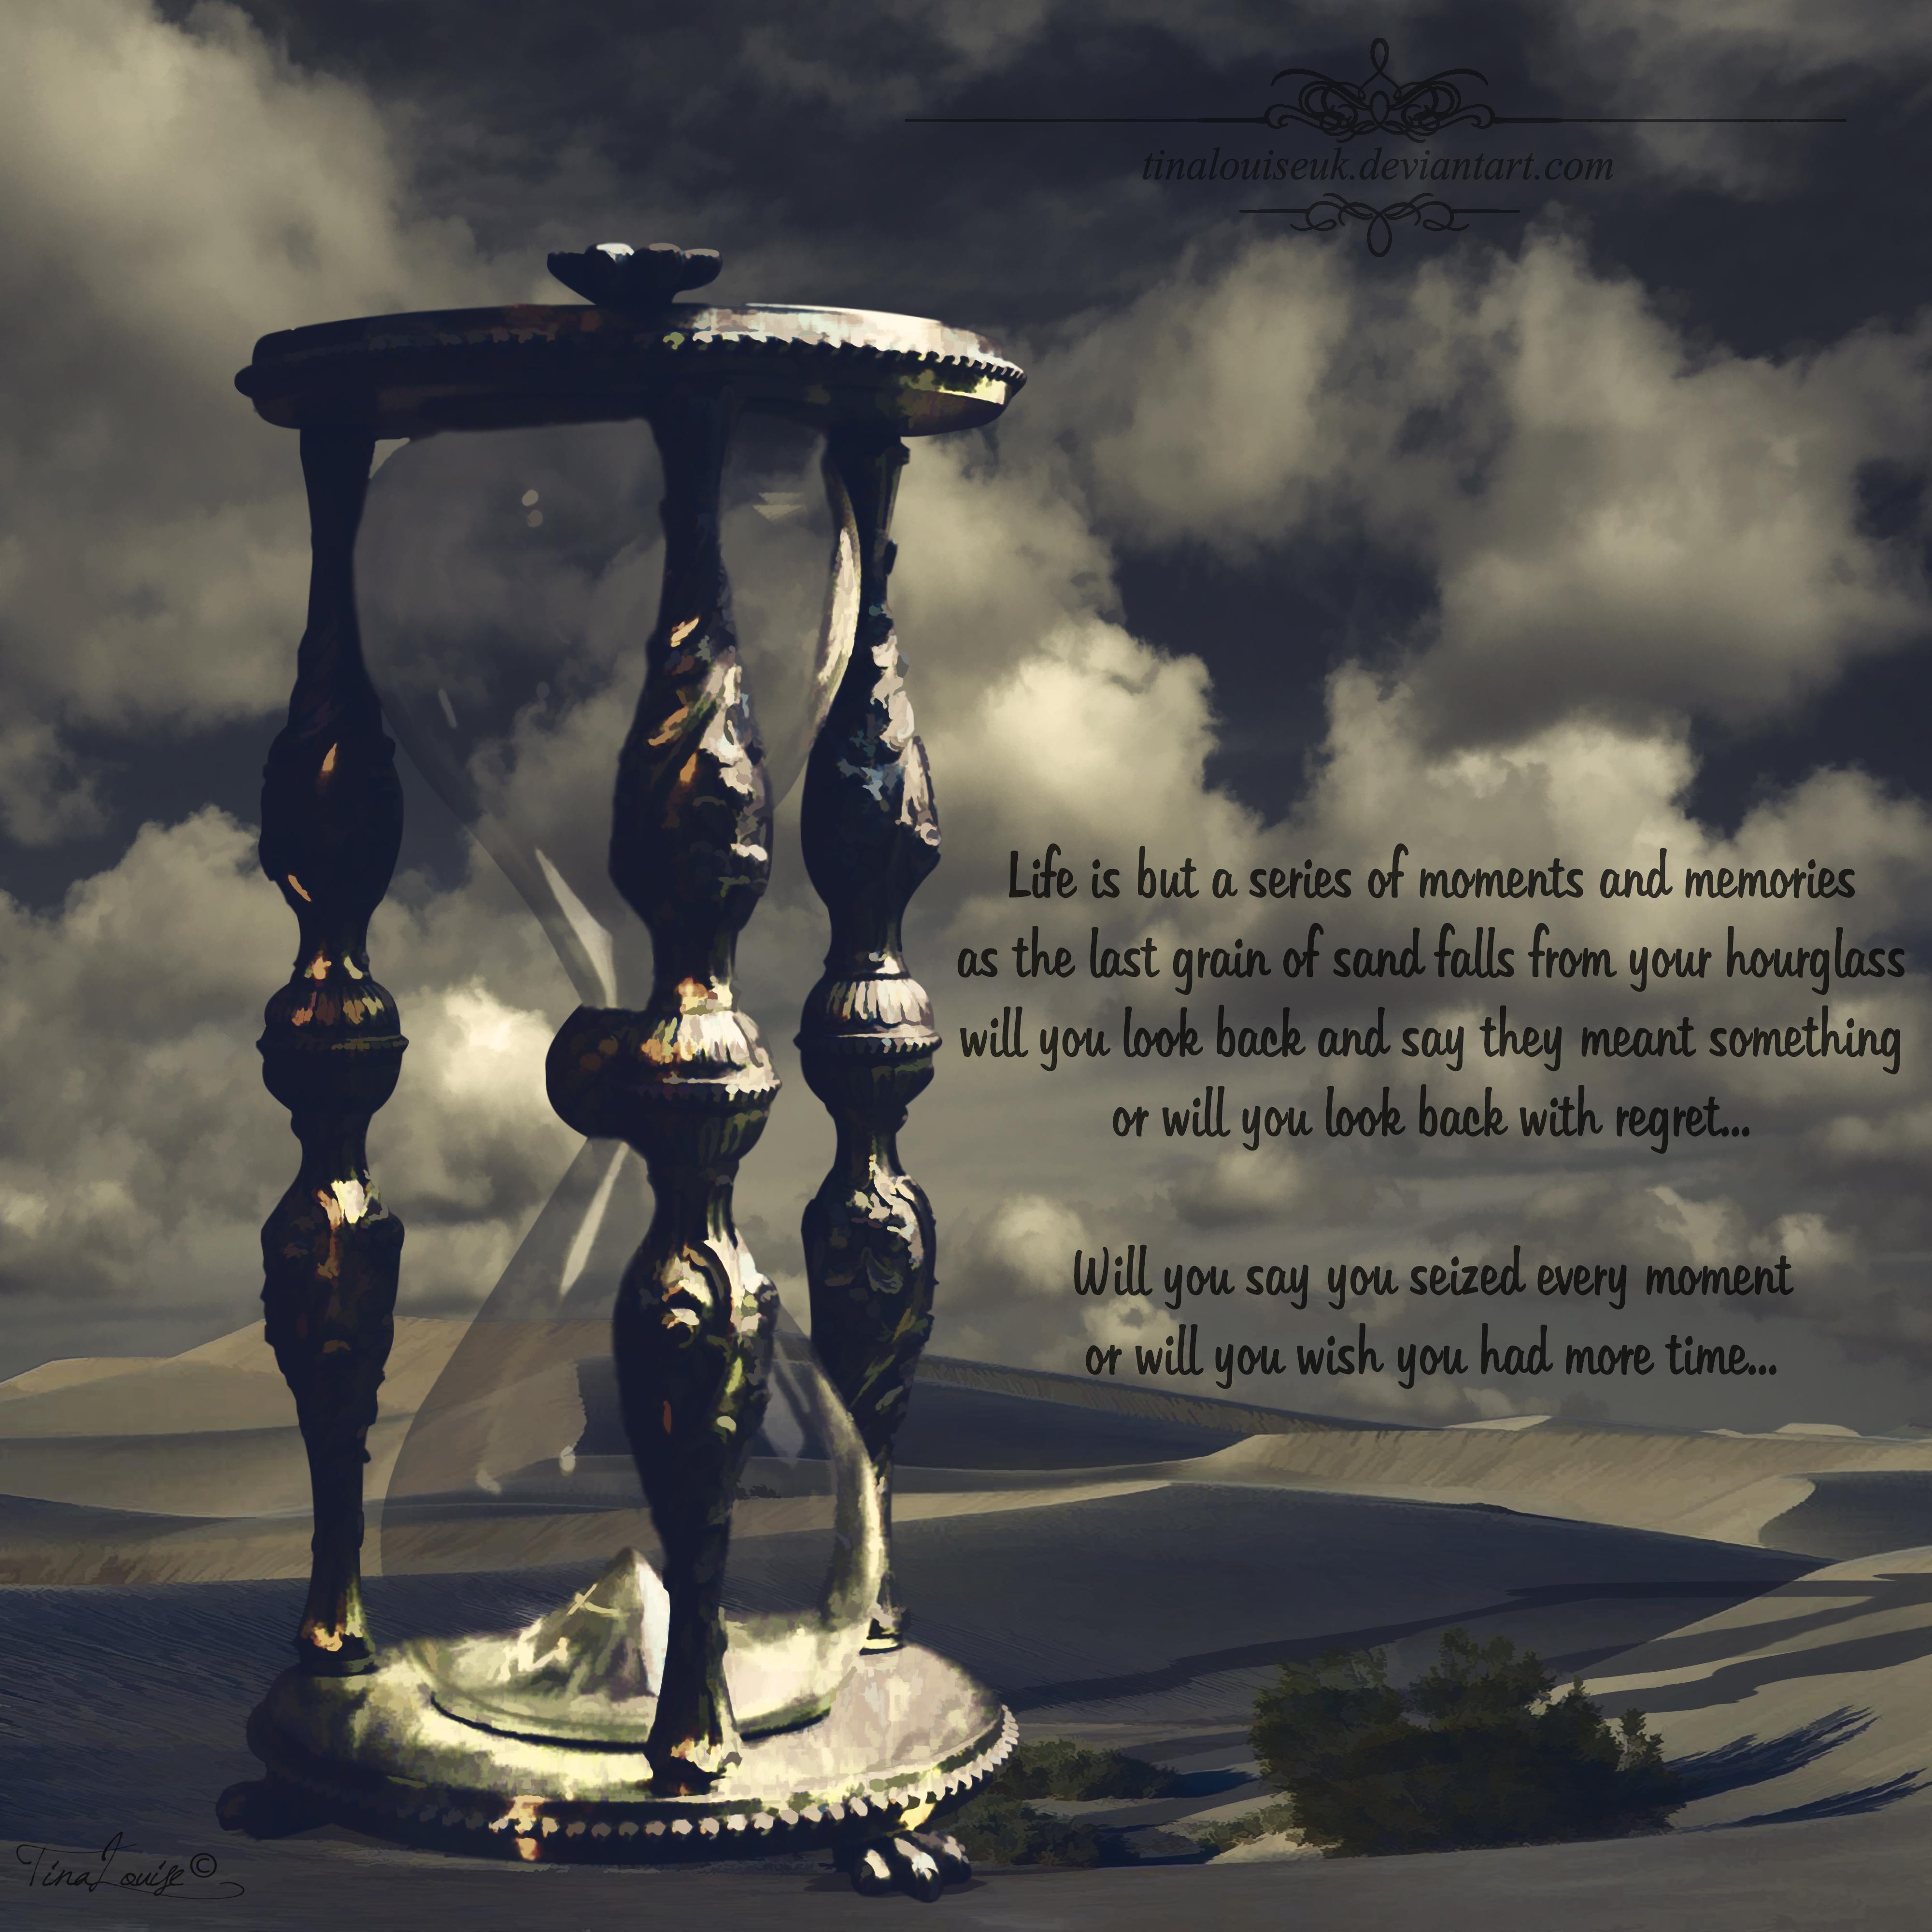 Hourglass_of_life